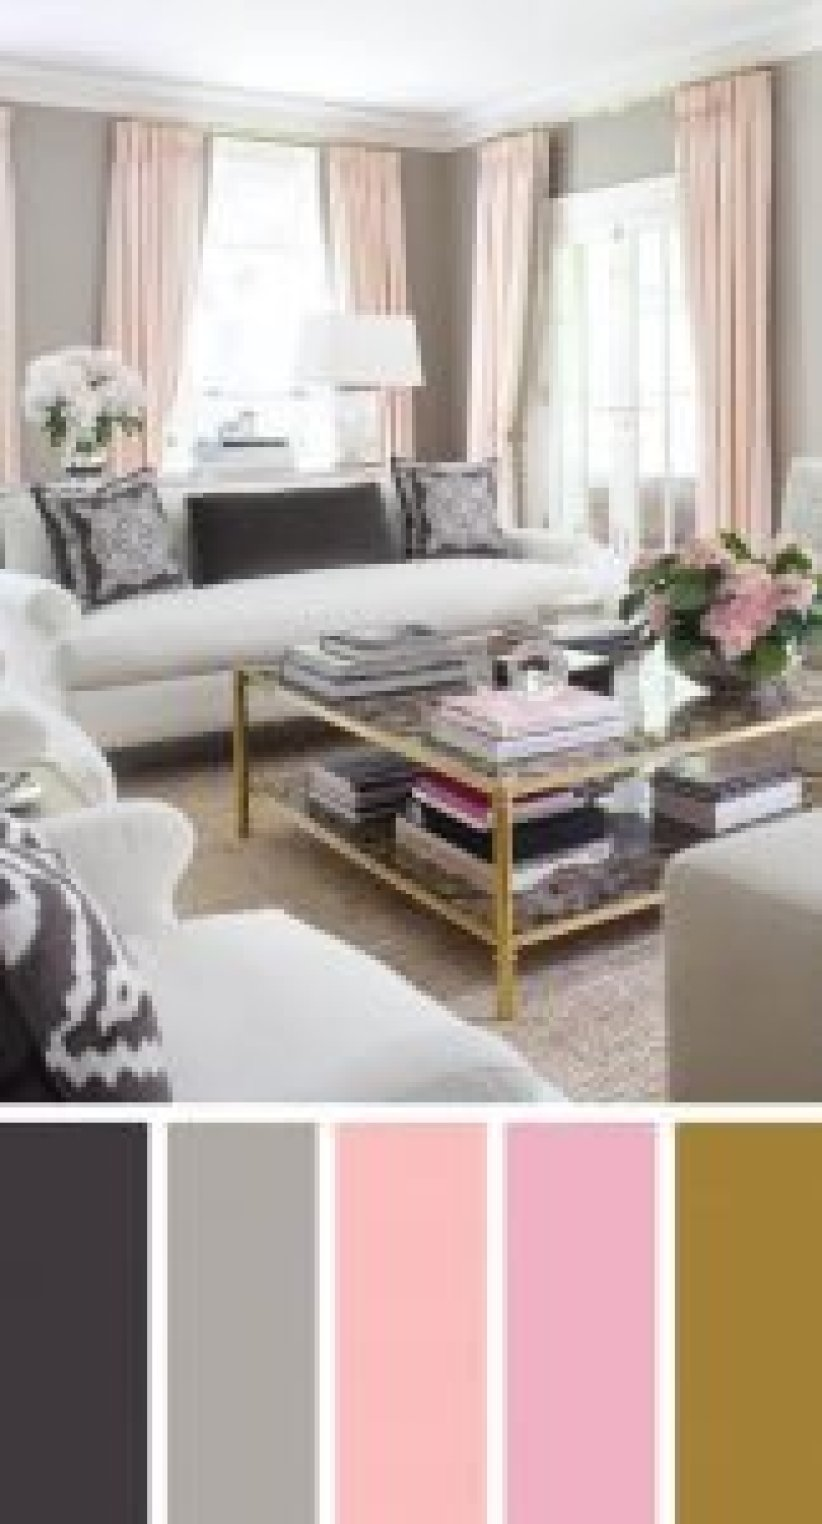 Wonderful living room color schemes #livingroomcolorschemes #livingroomcolorcombination